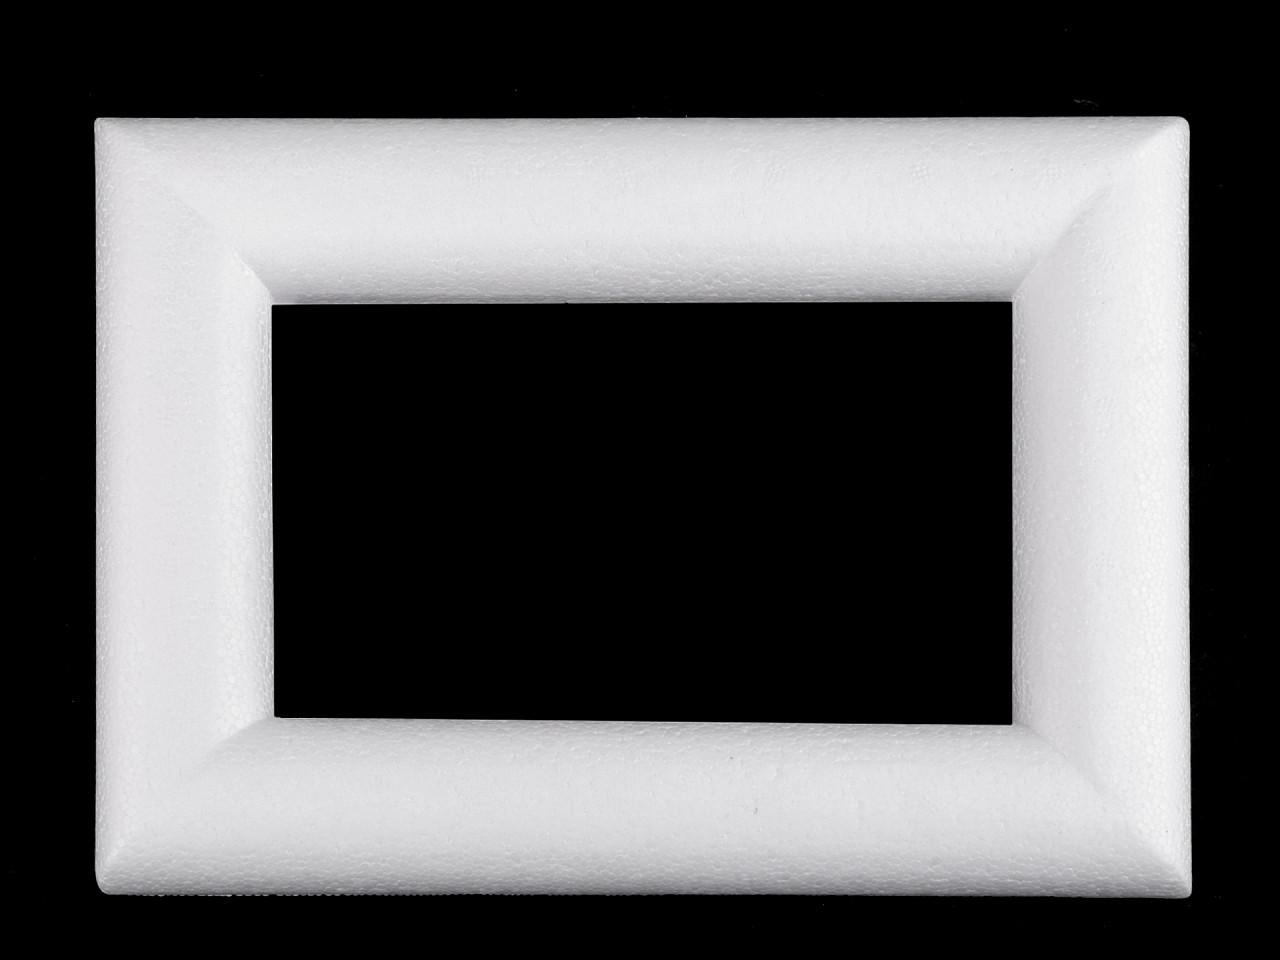 Rámeček 16,5x23 cm polystyren 1 ks